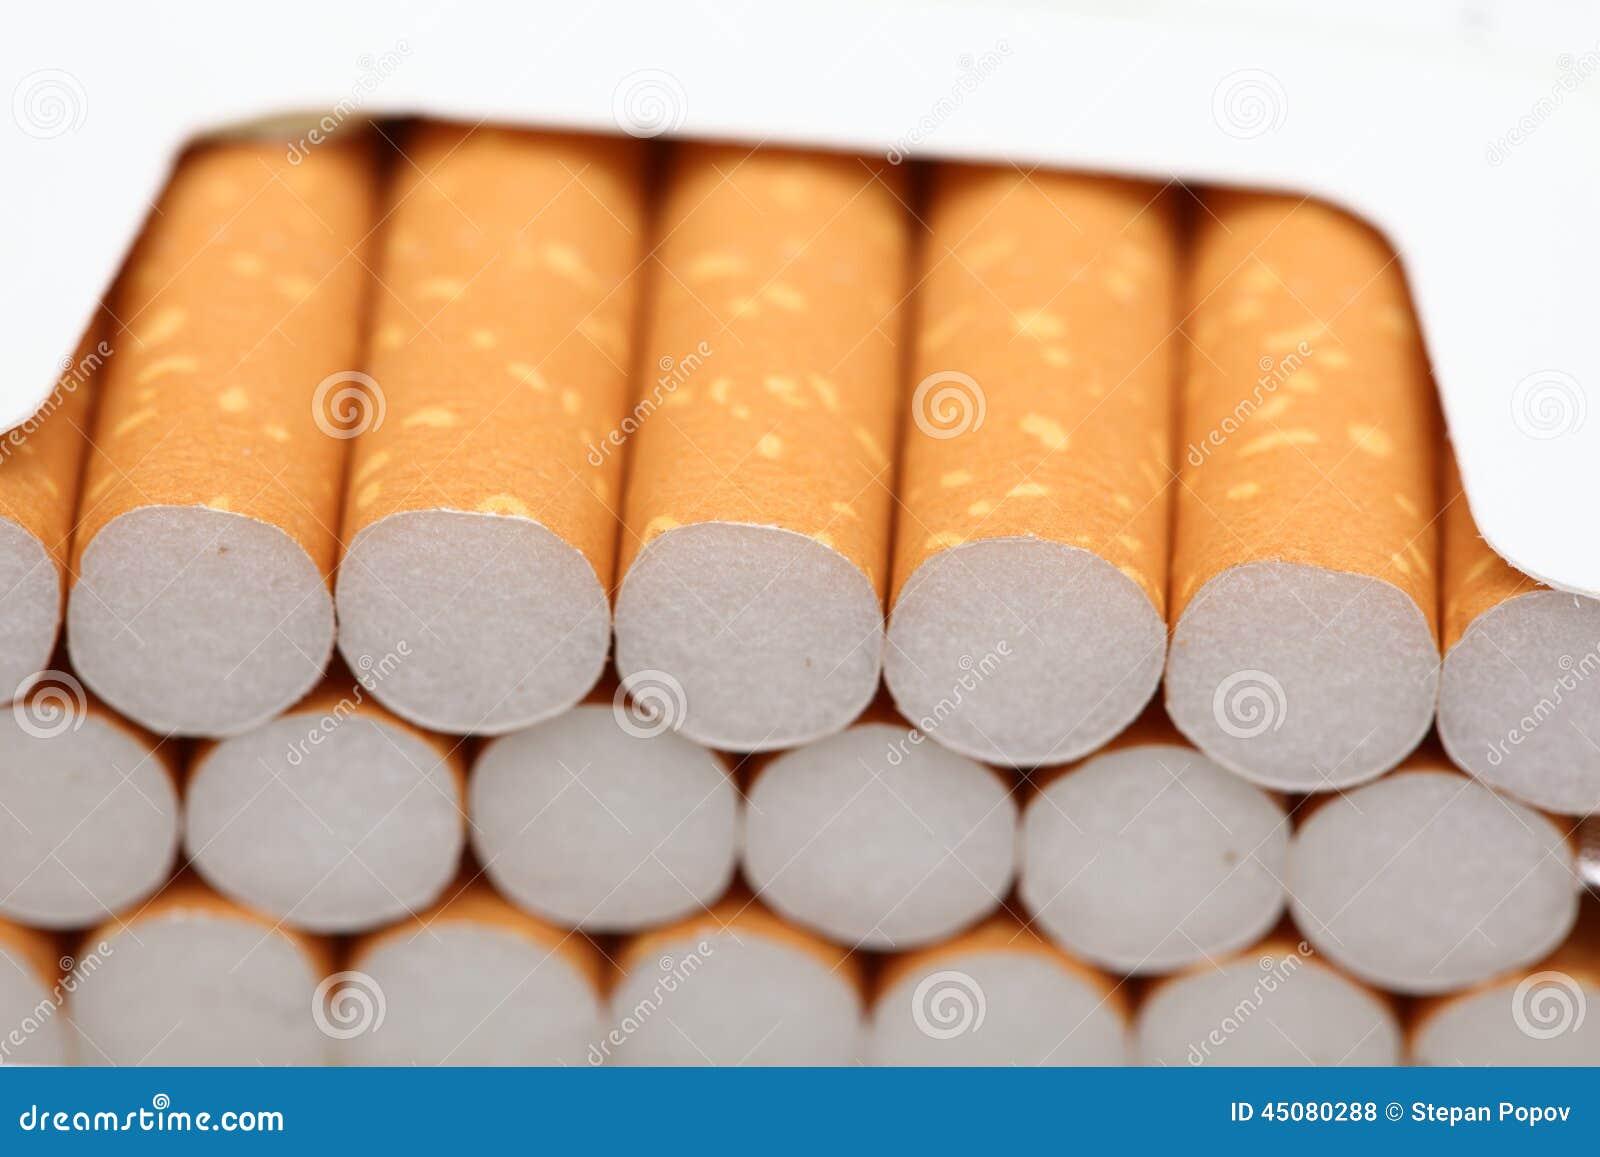 Open pak sigaretten